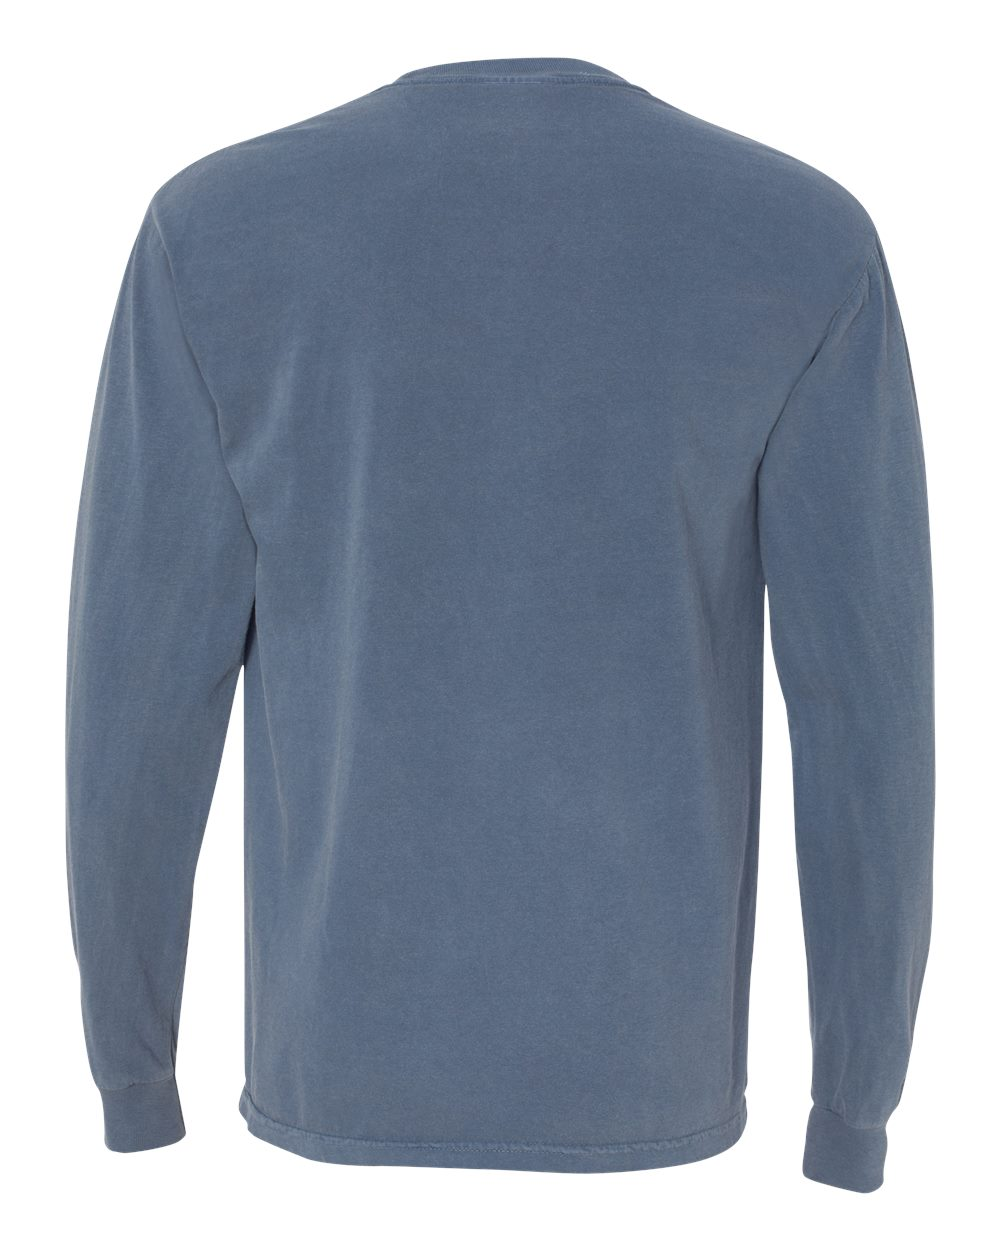 Comfort-Colors-Men-039-s-6-1-oz-Long-Sleeve-Pocket-T-Shirt-C4410-S-3XL thumbnail 7